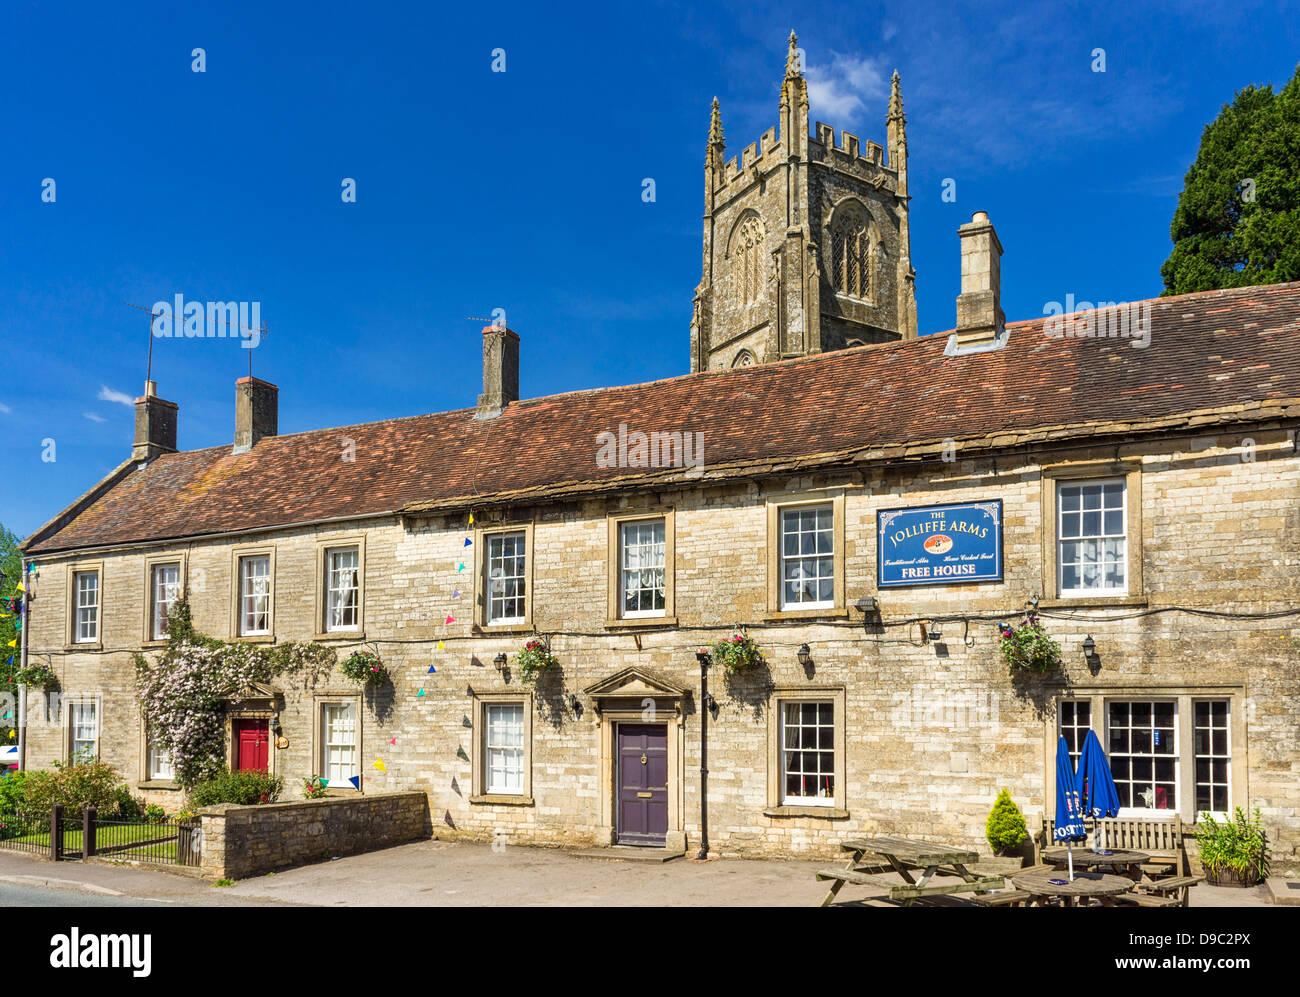 English village pub - Jolliffe Arms at Kilmersdon, Somerset, England, UK - with church behind - Stock Image